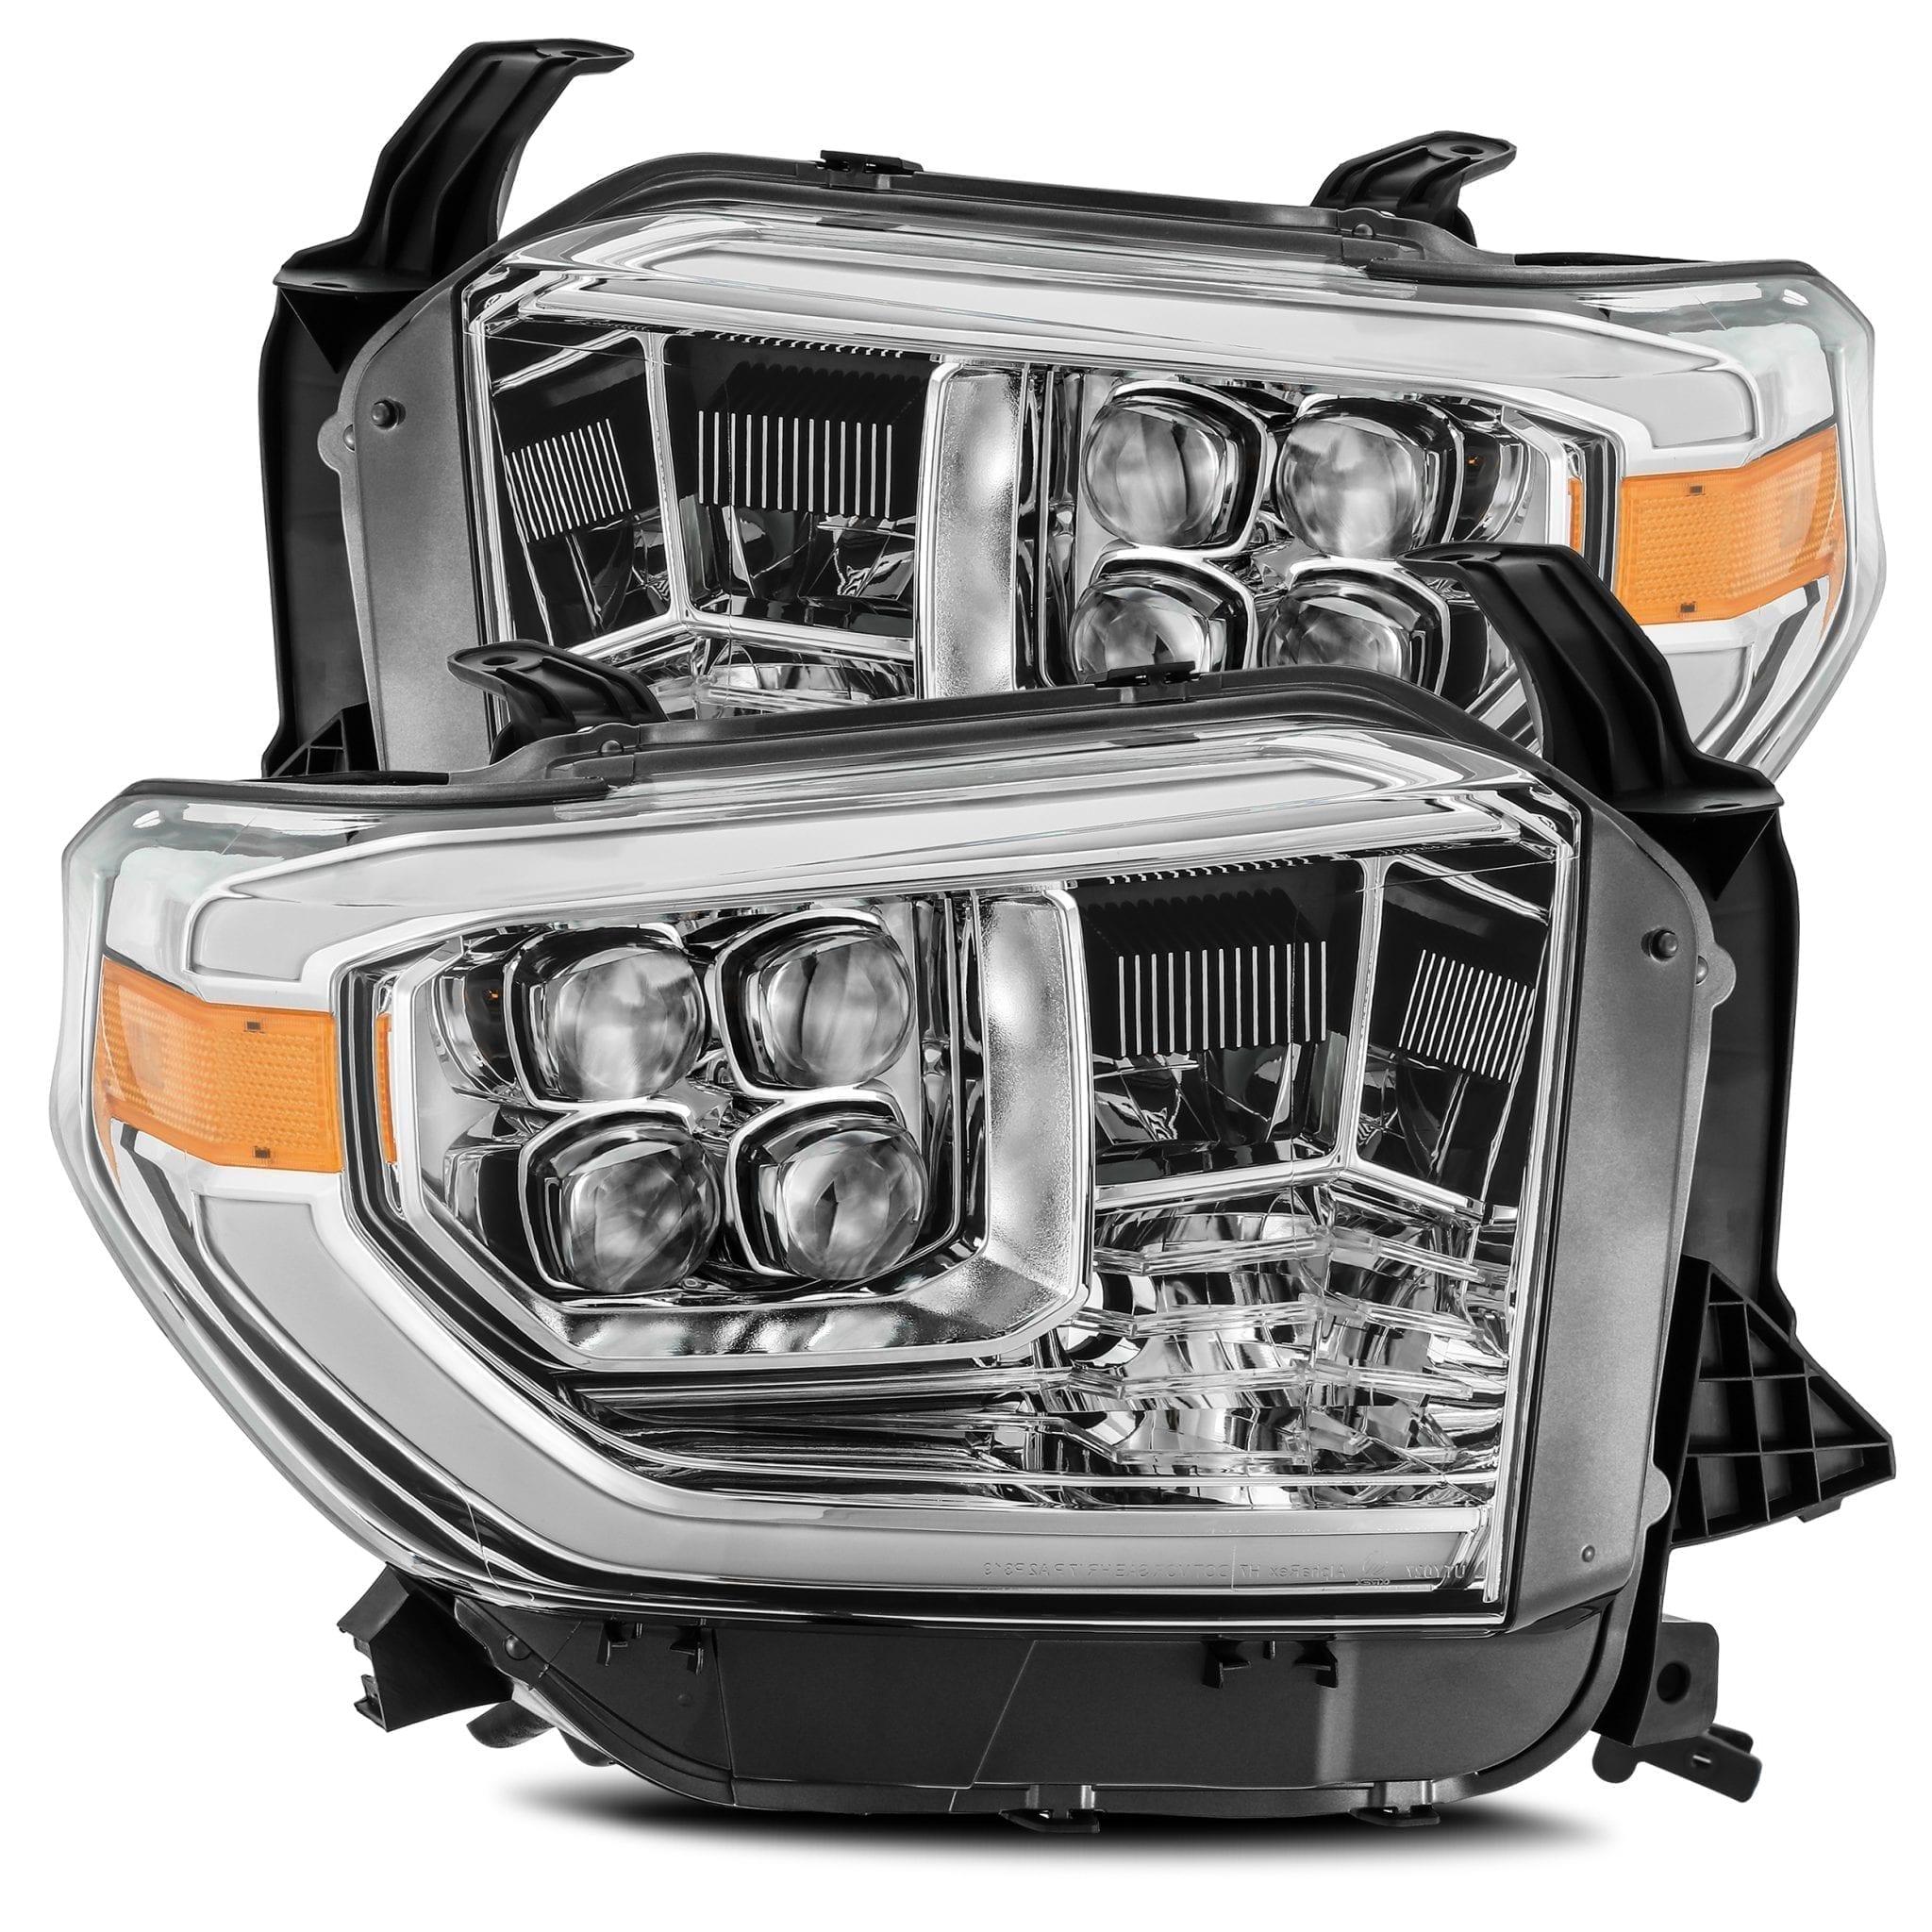 2014 2015 2016 2017 2018 2019 Toyota Tundra NOVA-Series Full LED Projector Headlights Chrome